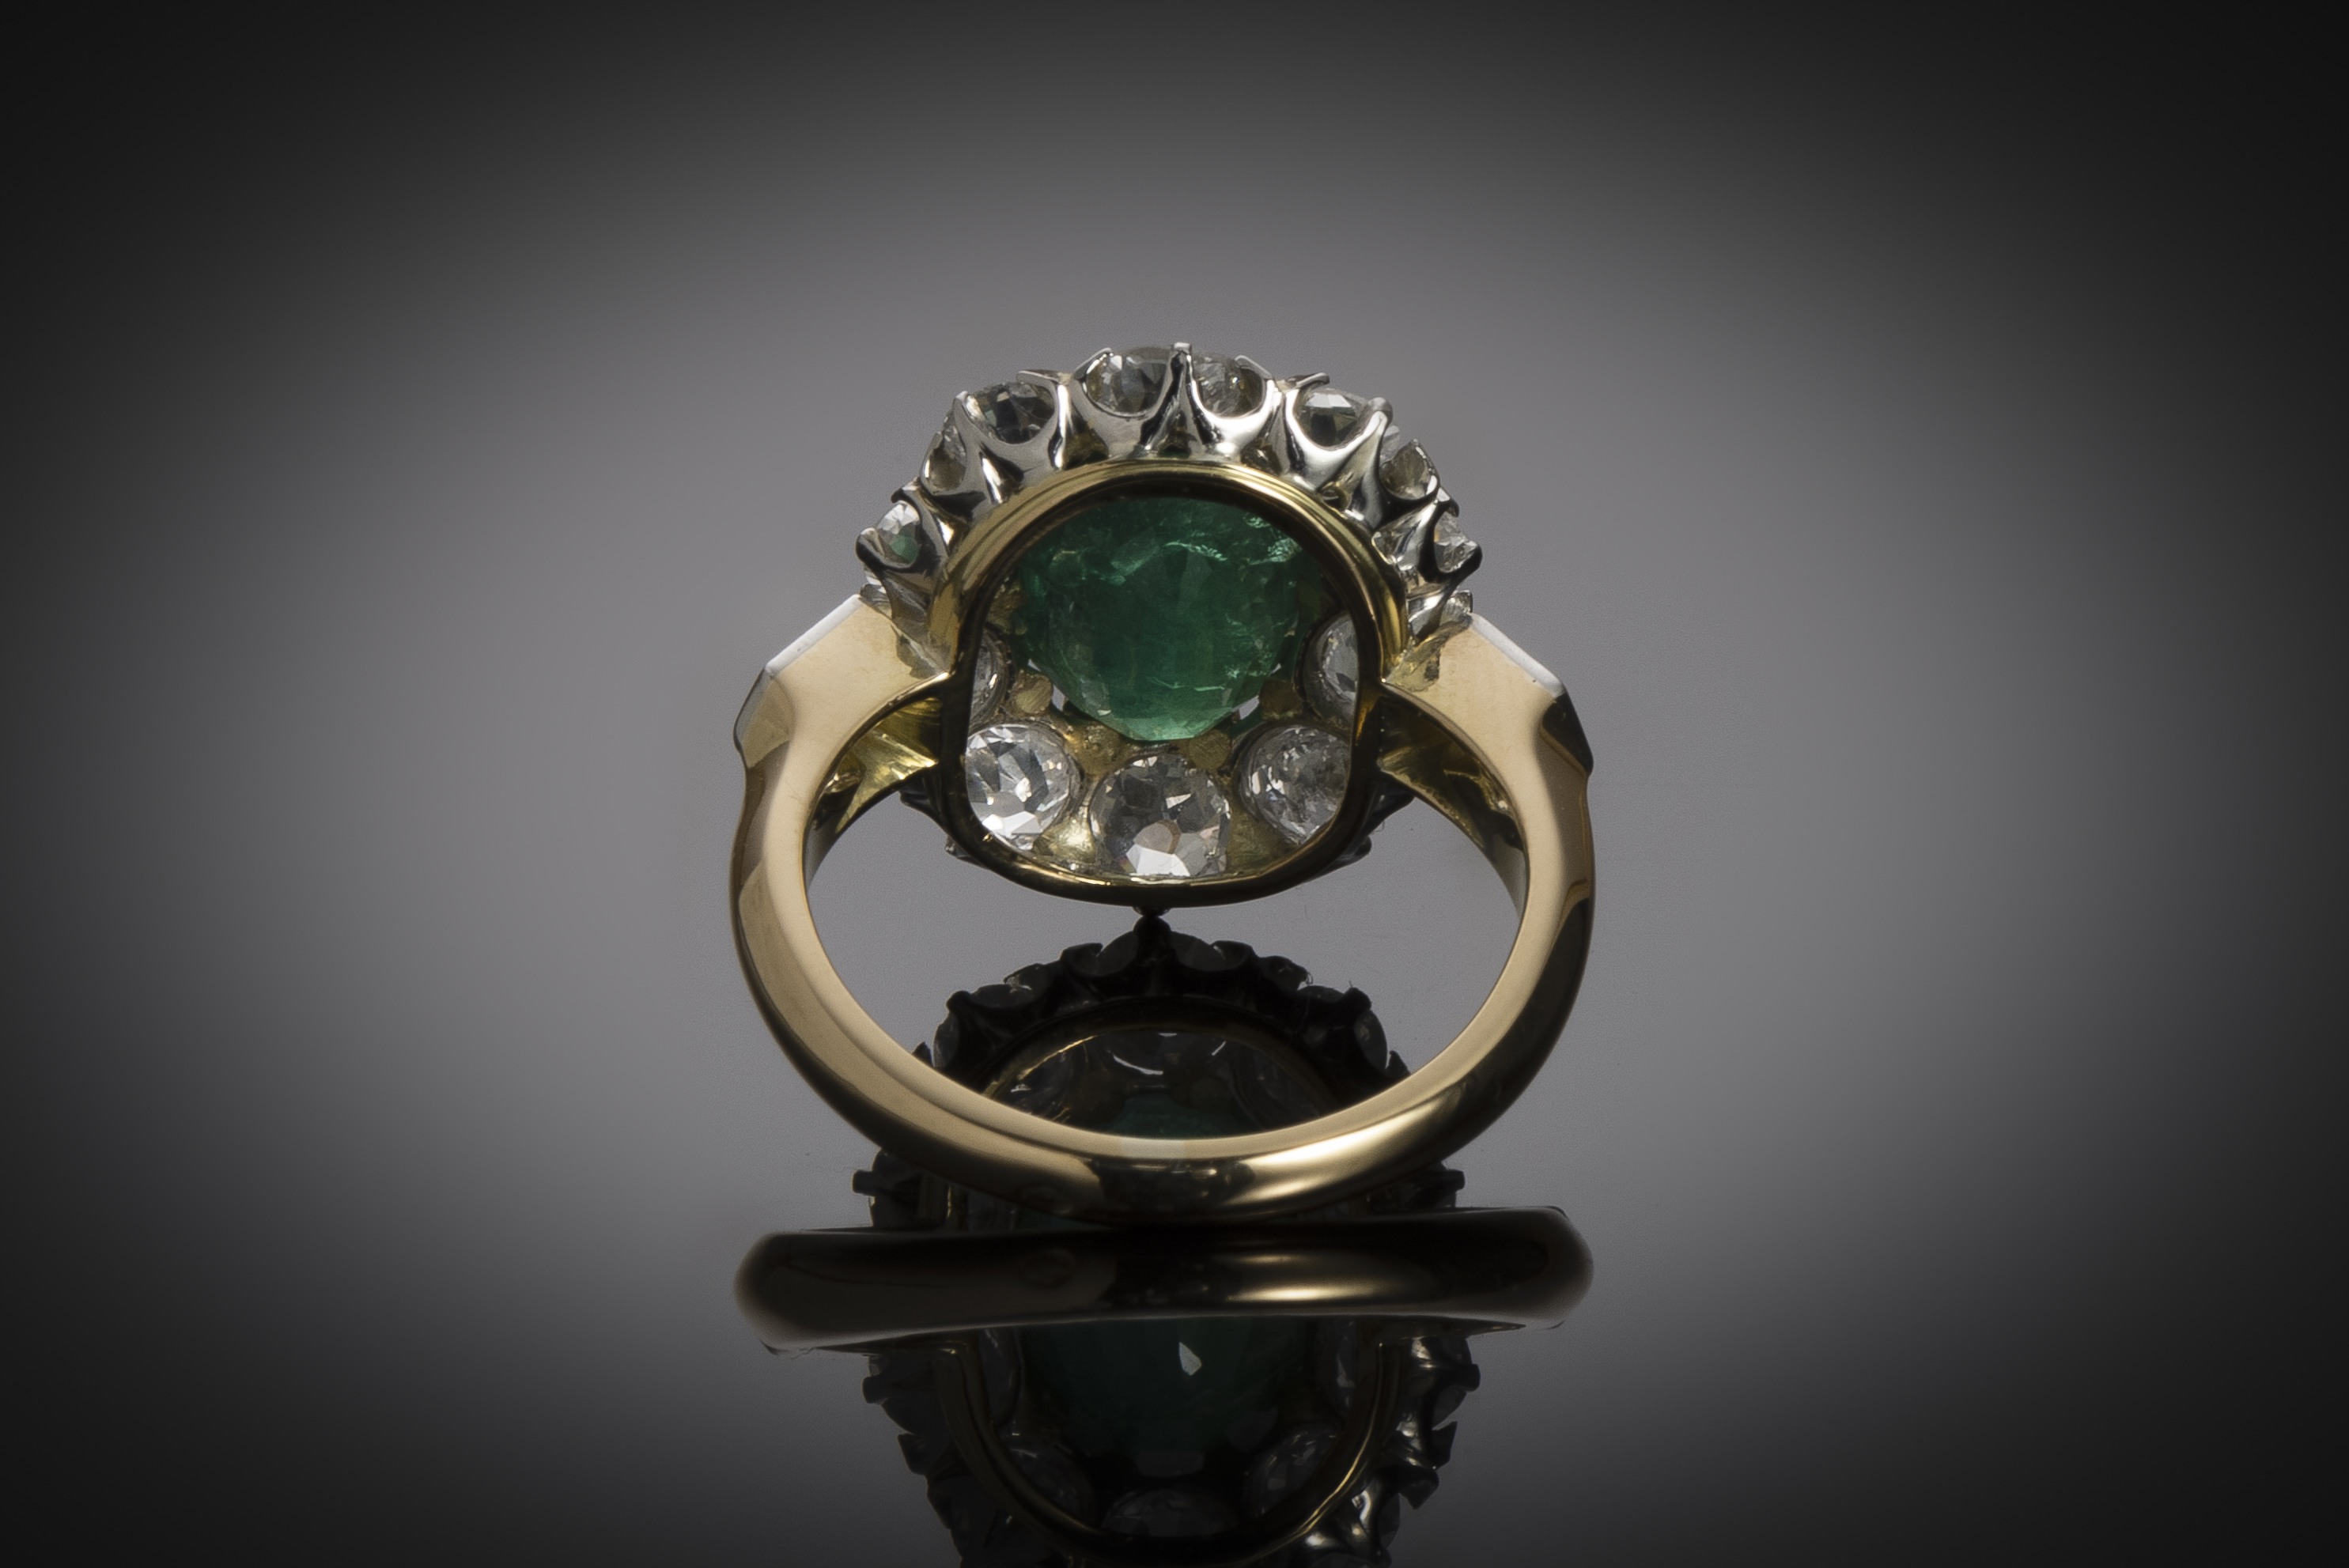 An early 20th century emerald an diamond ring-3